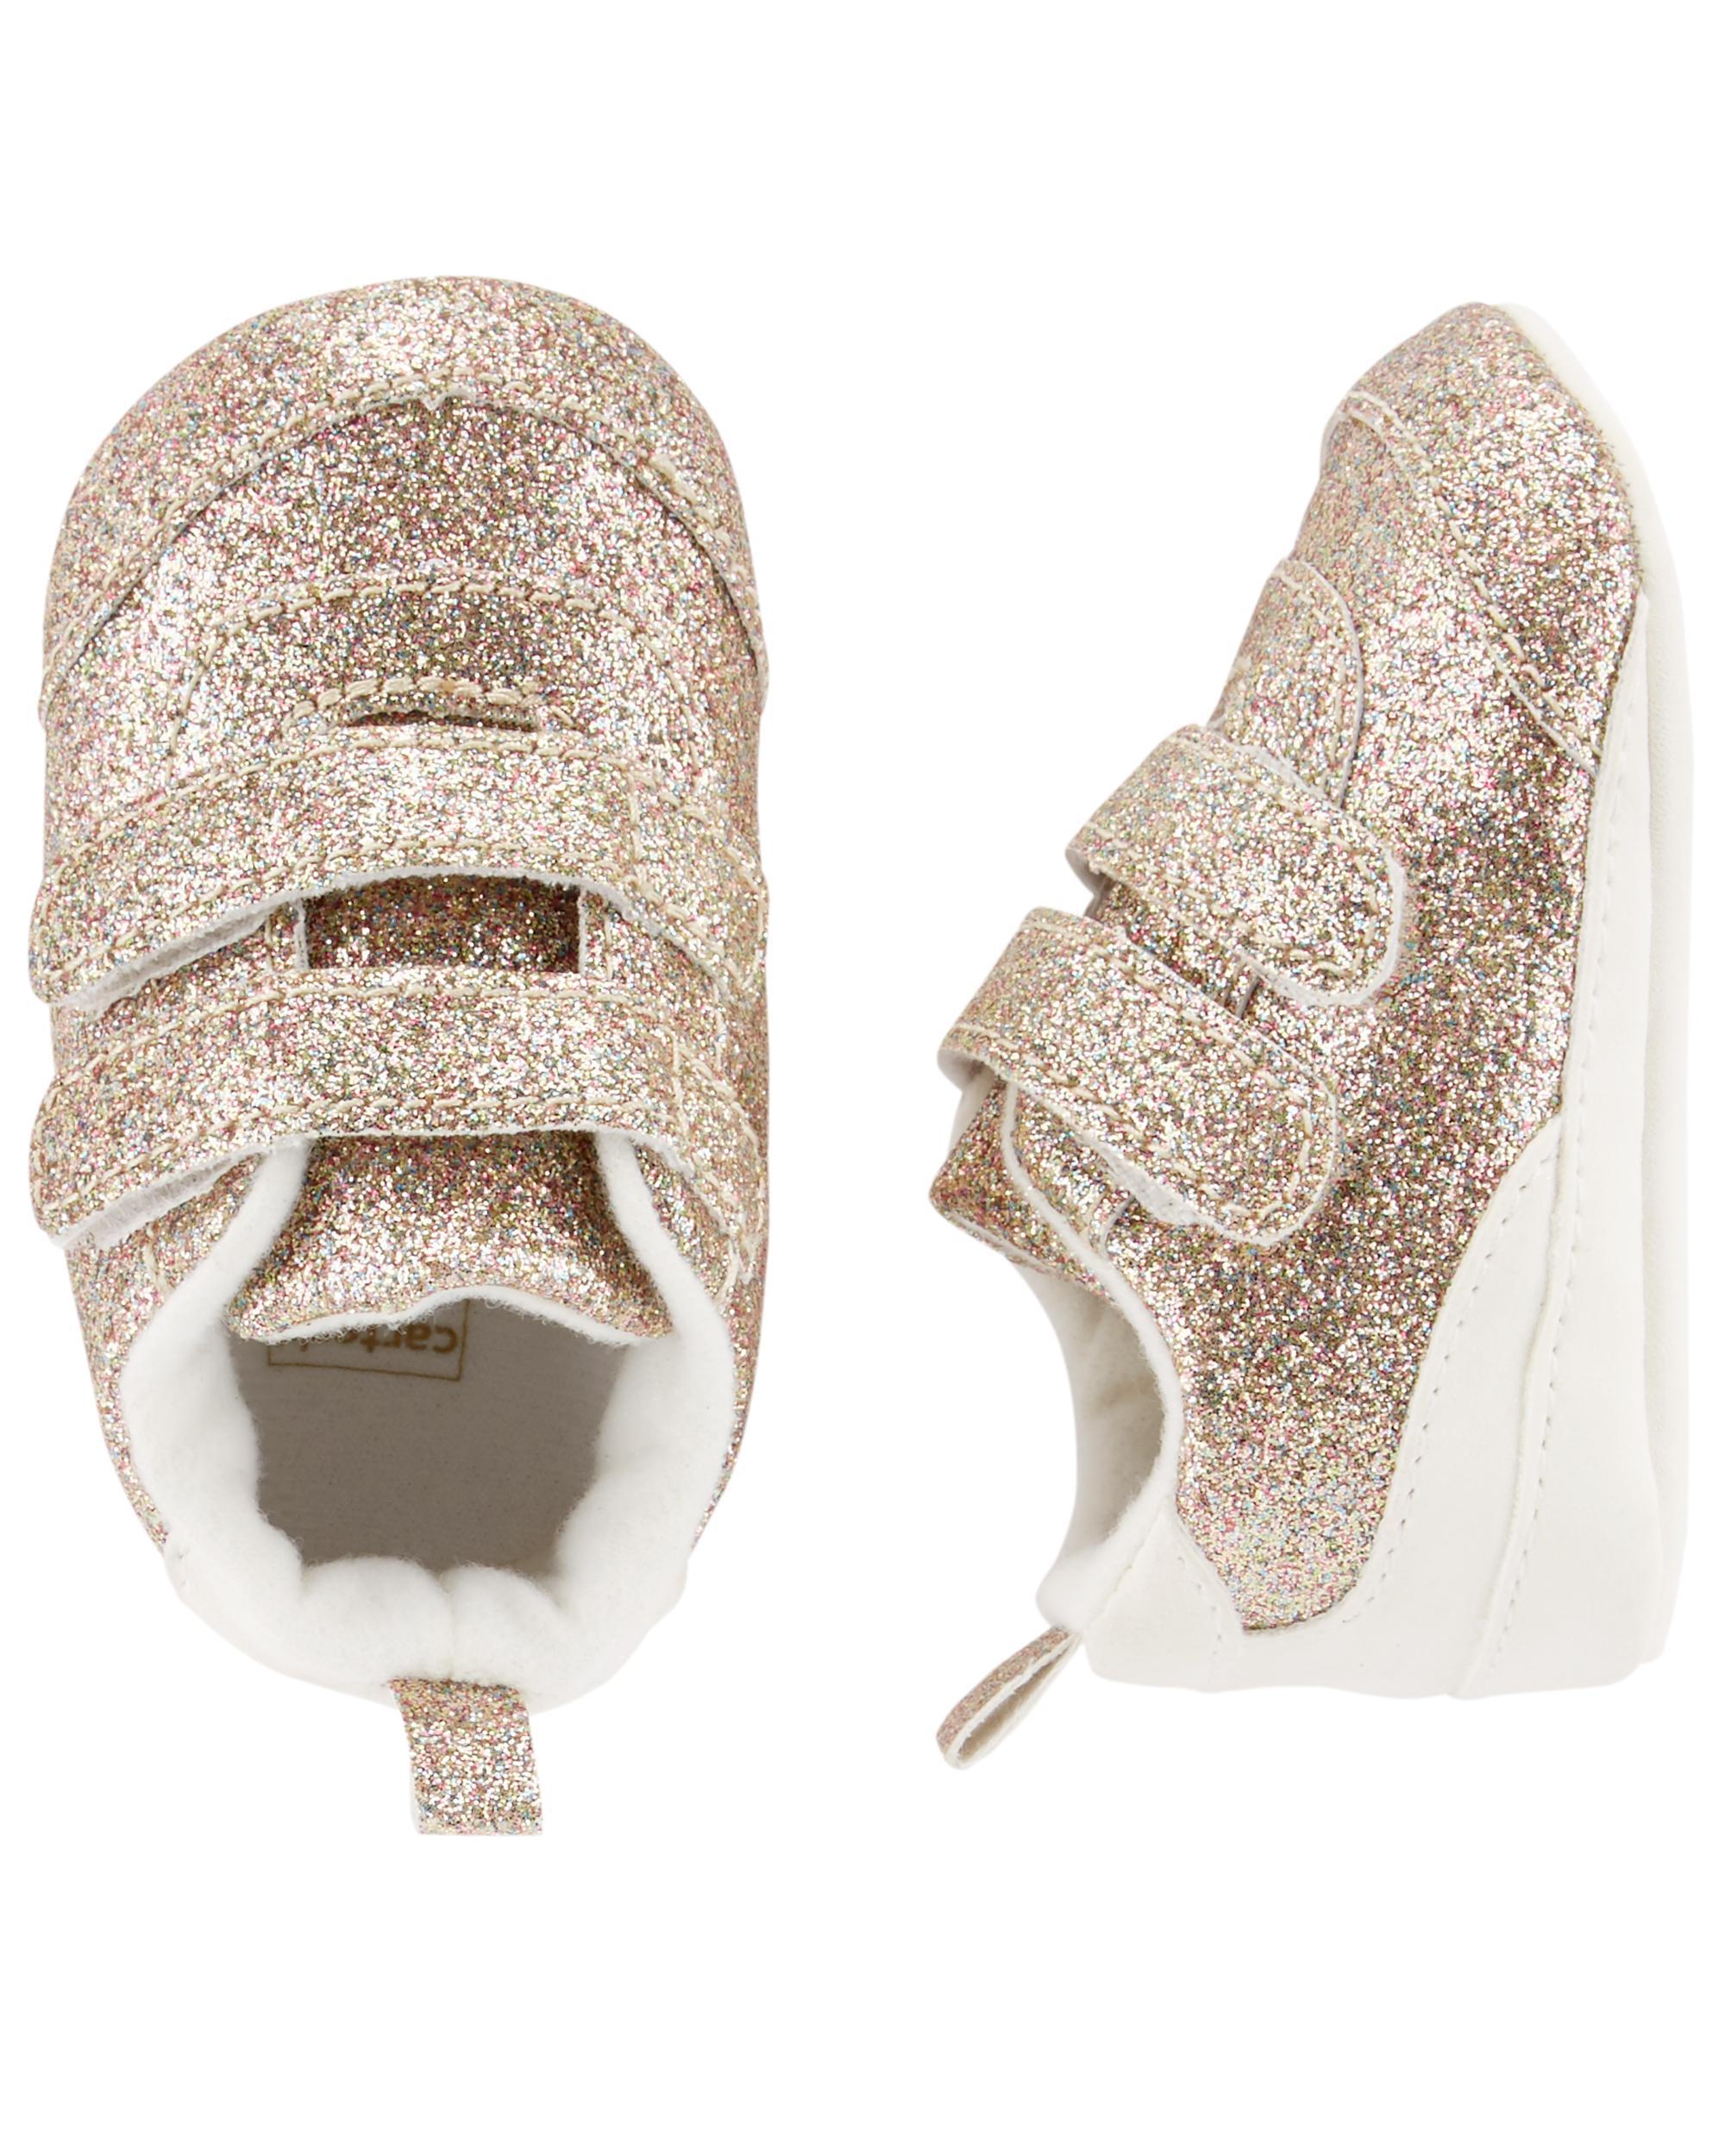 62ecfac50f Carter's Glitter Sneaker Baby Shoes | carters.com